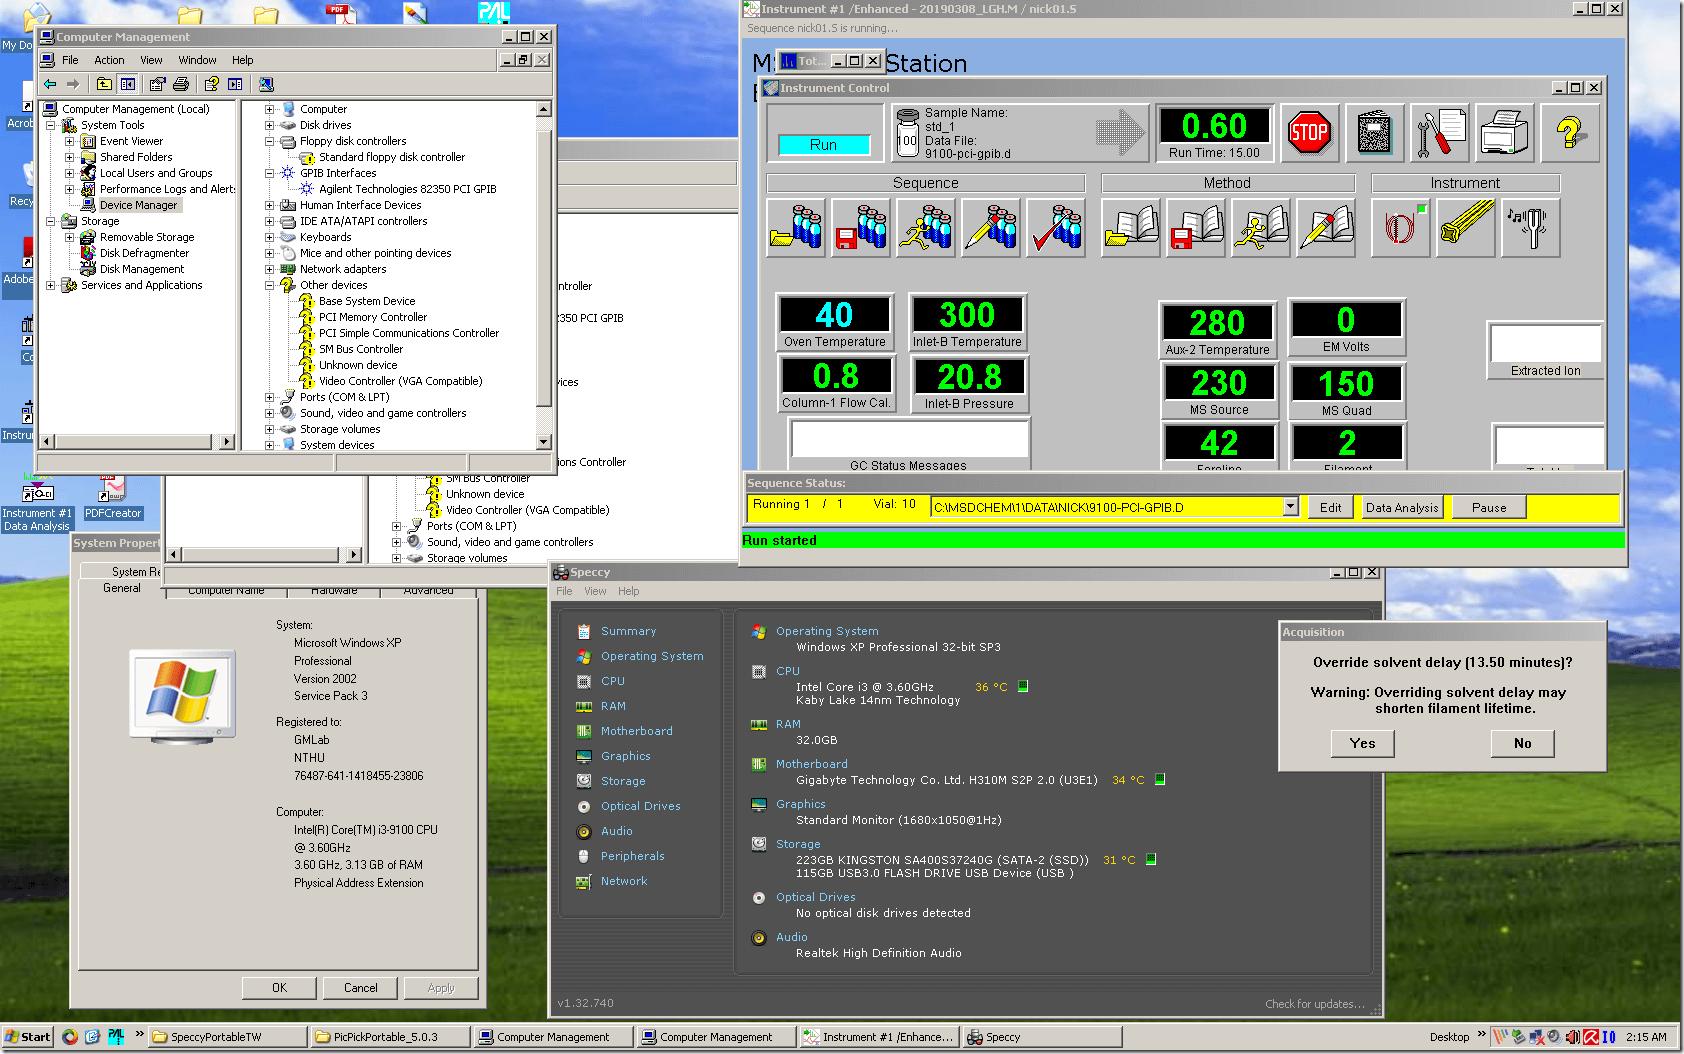 H310M_XP_9100-PCI-GPIB02